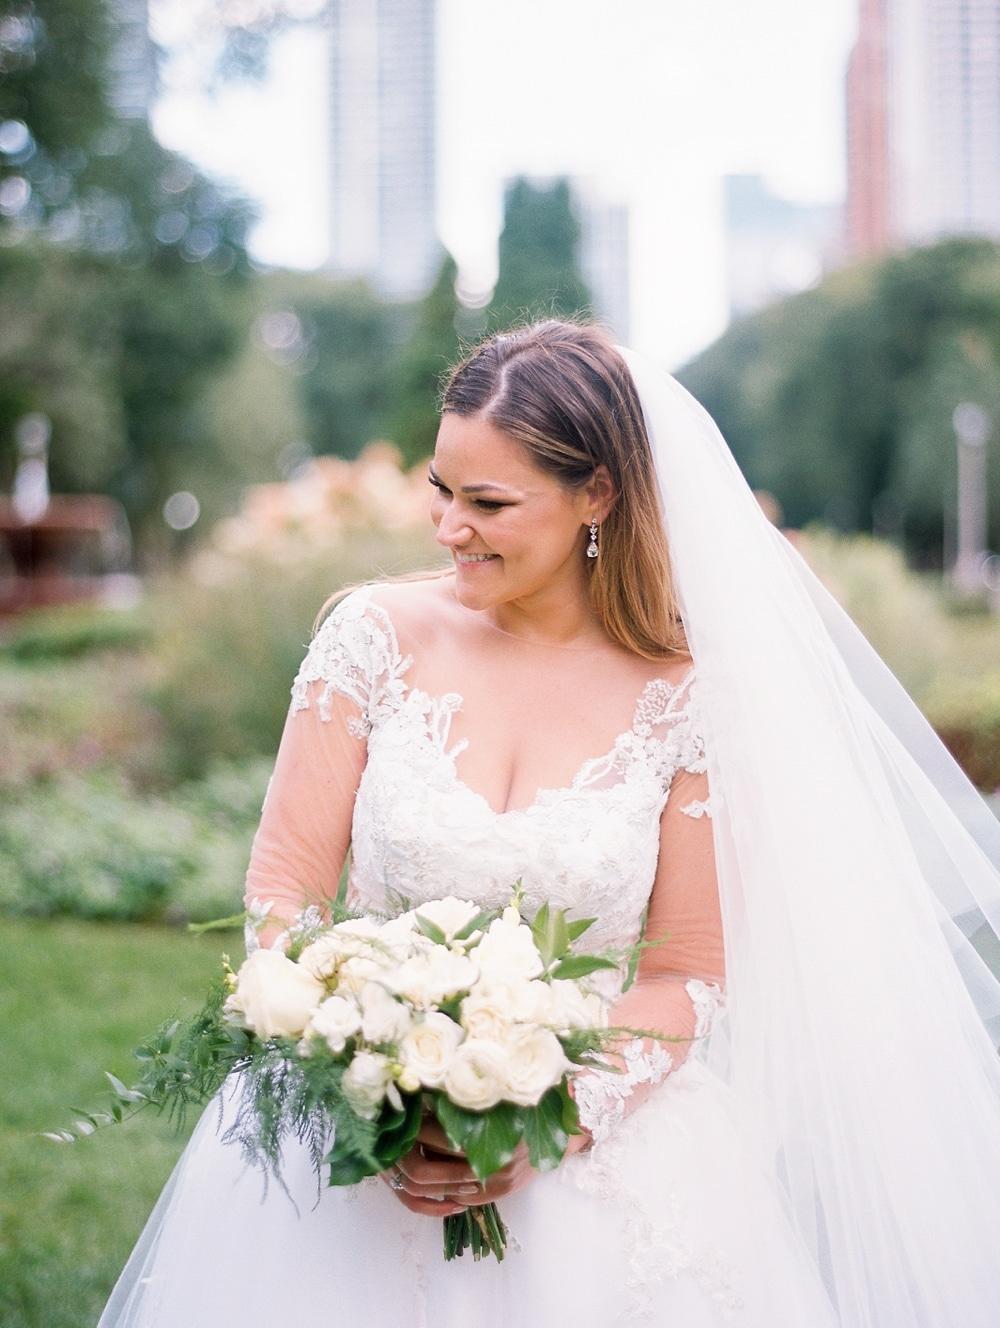 Kristin-La-Voie-Photography-field-museum-chicago-wedding-photos-87